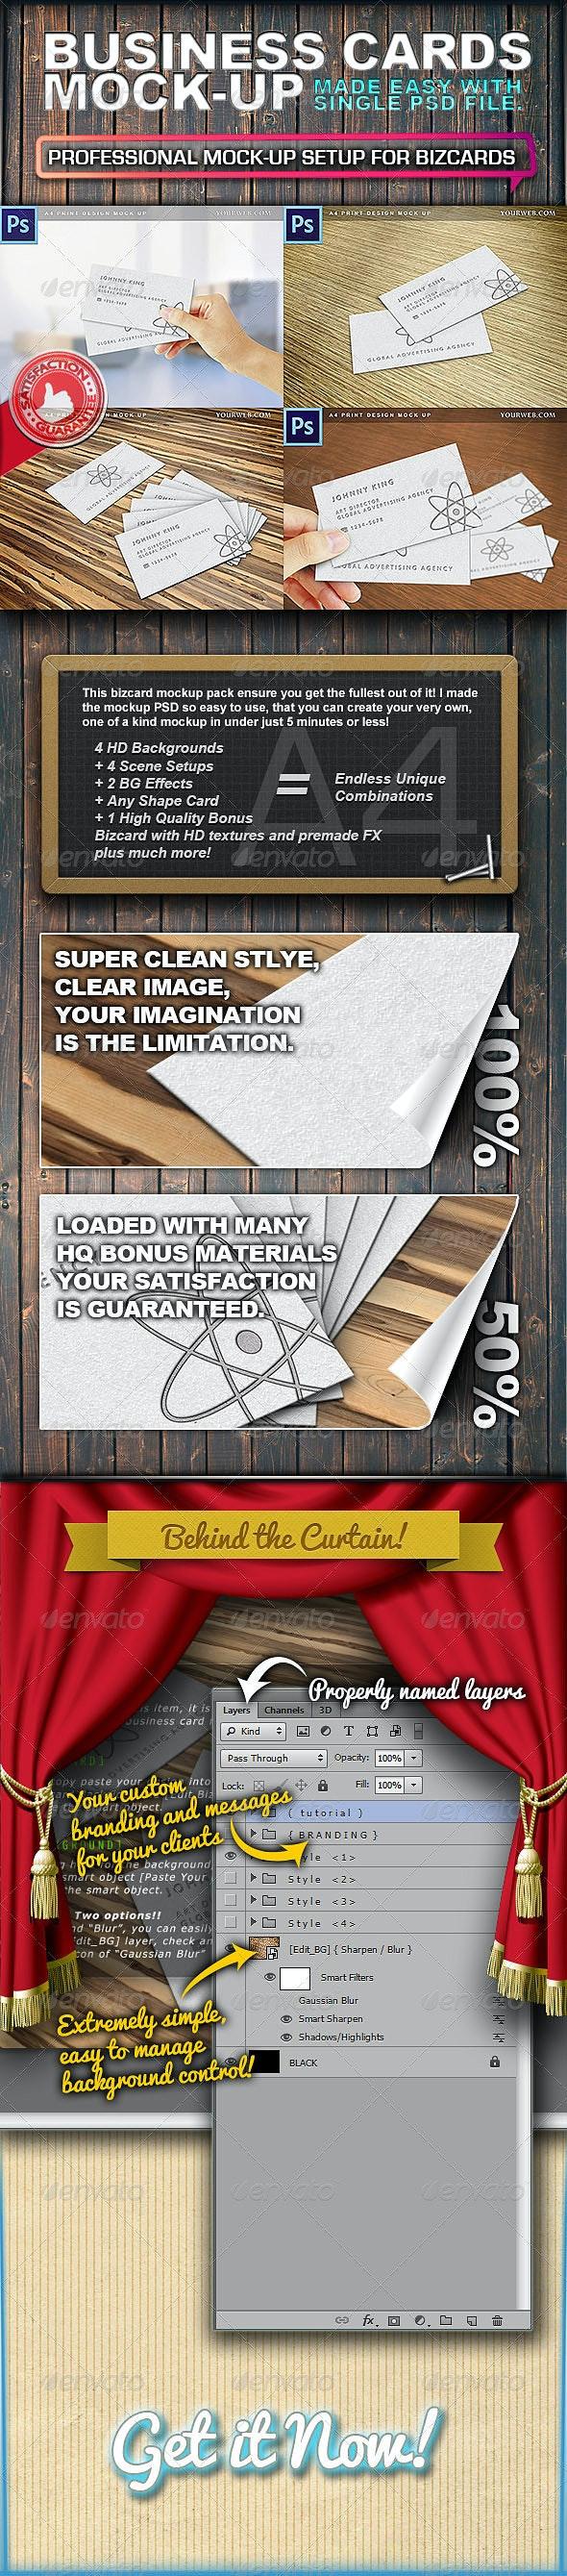 A4 Print 4 Styles Bizcard Mock Ups - Business Cards Print